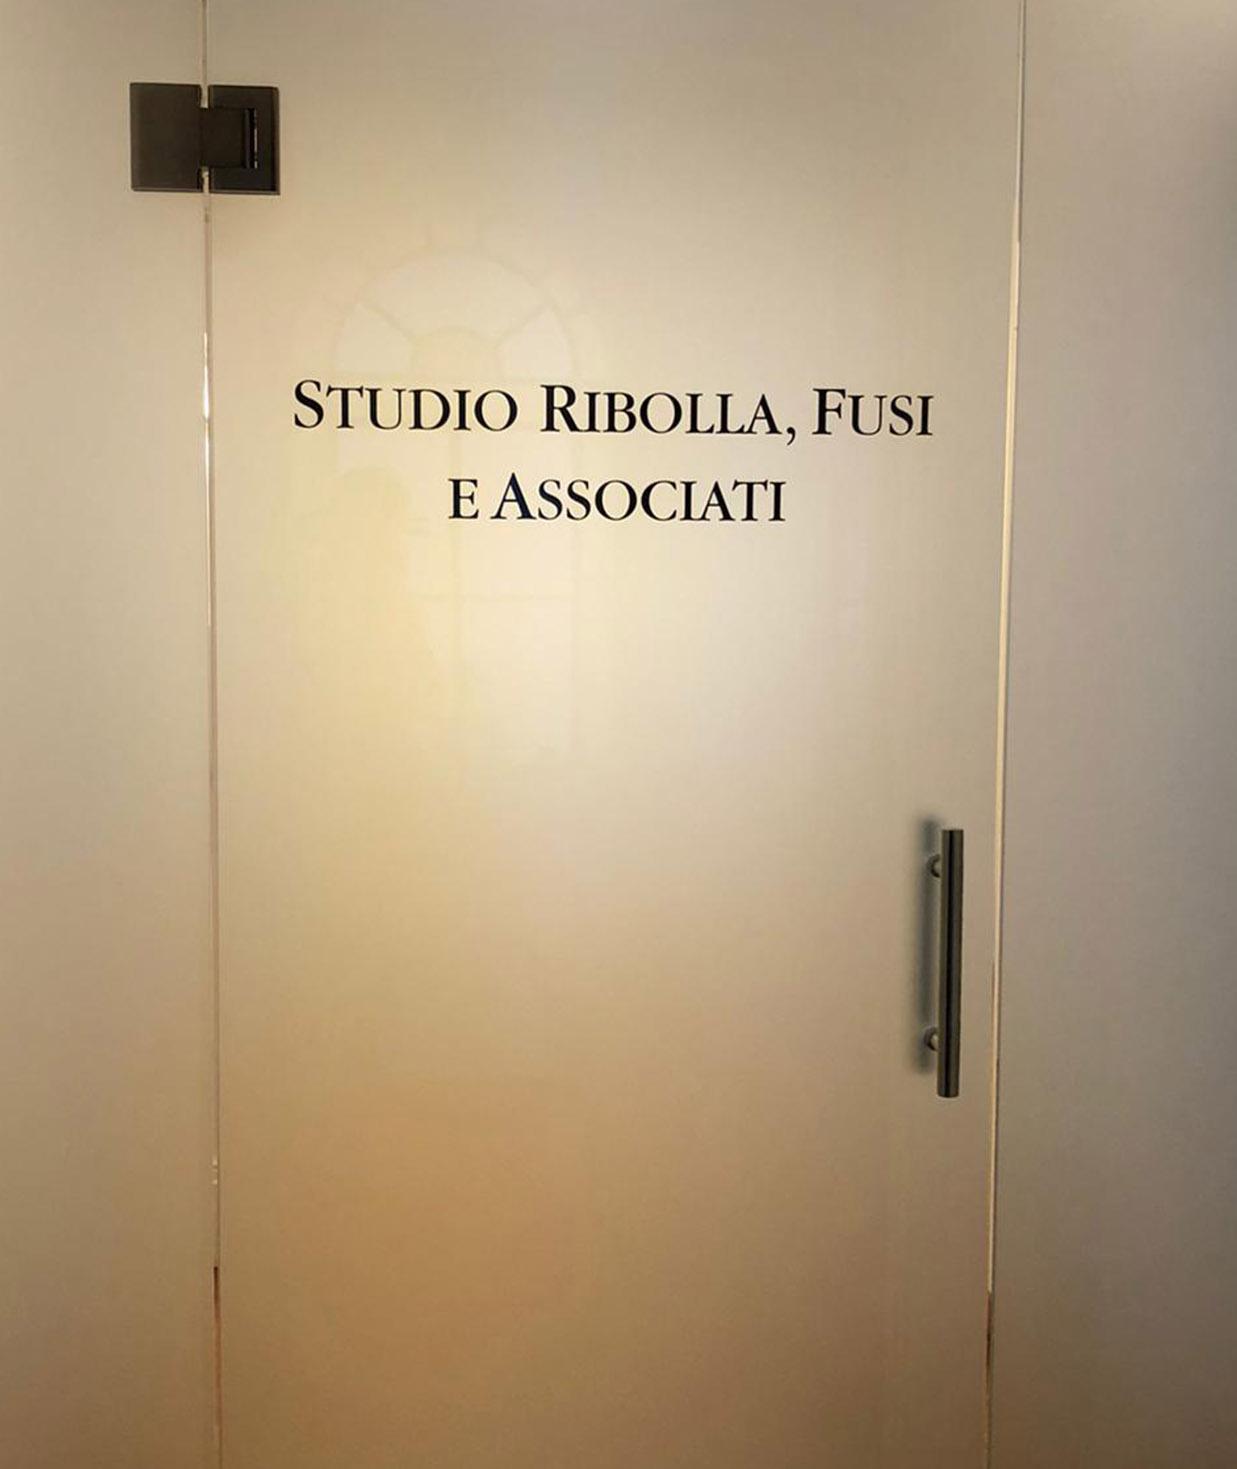 http://www.ribollaeassociati.com/wp-content/uploads/2020/04/Entrance.jpg